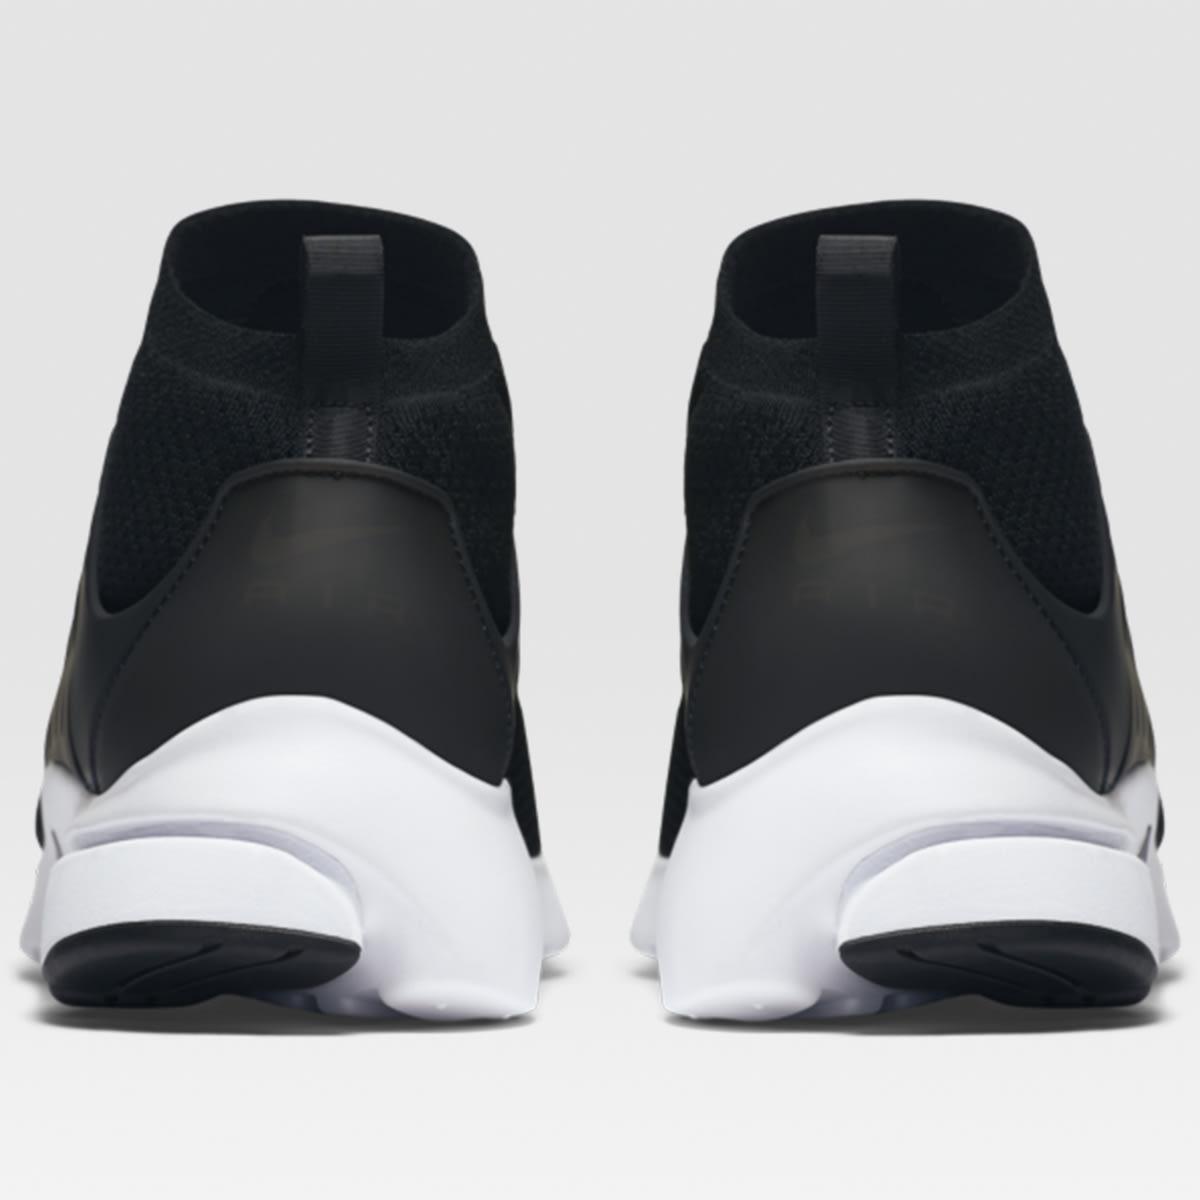 separation shoes 2147f 69bfa Nike Air Presto Ultra Flyknit Black, White   Electric Green   END.